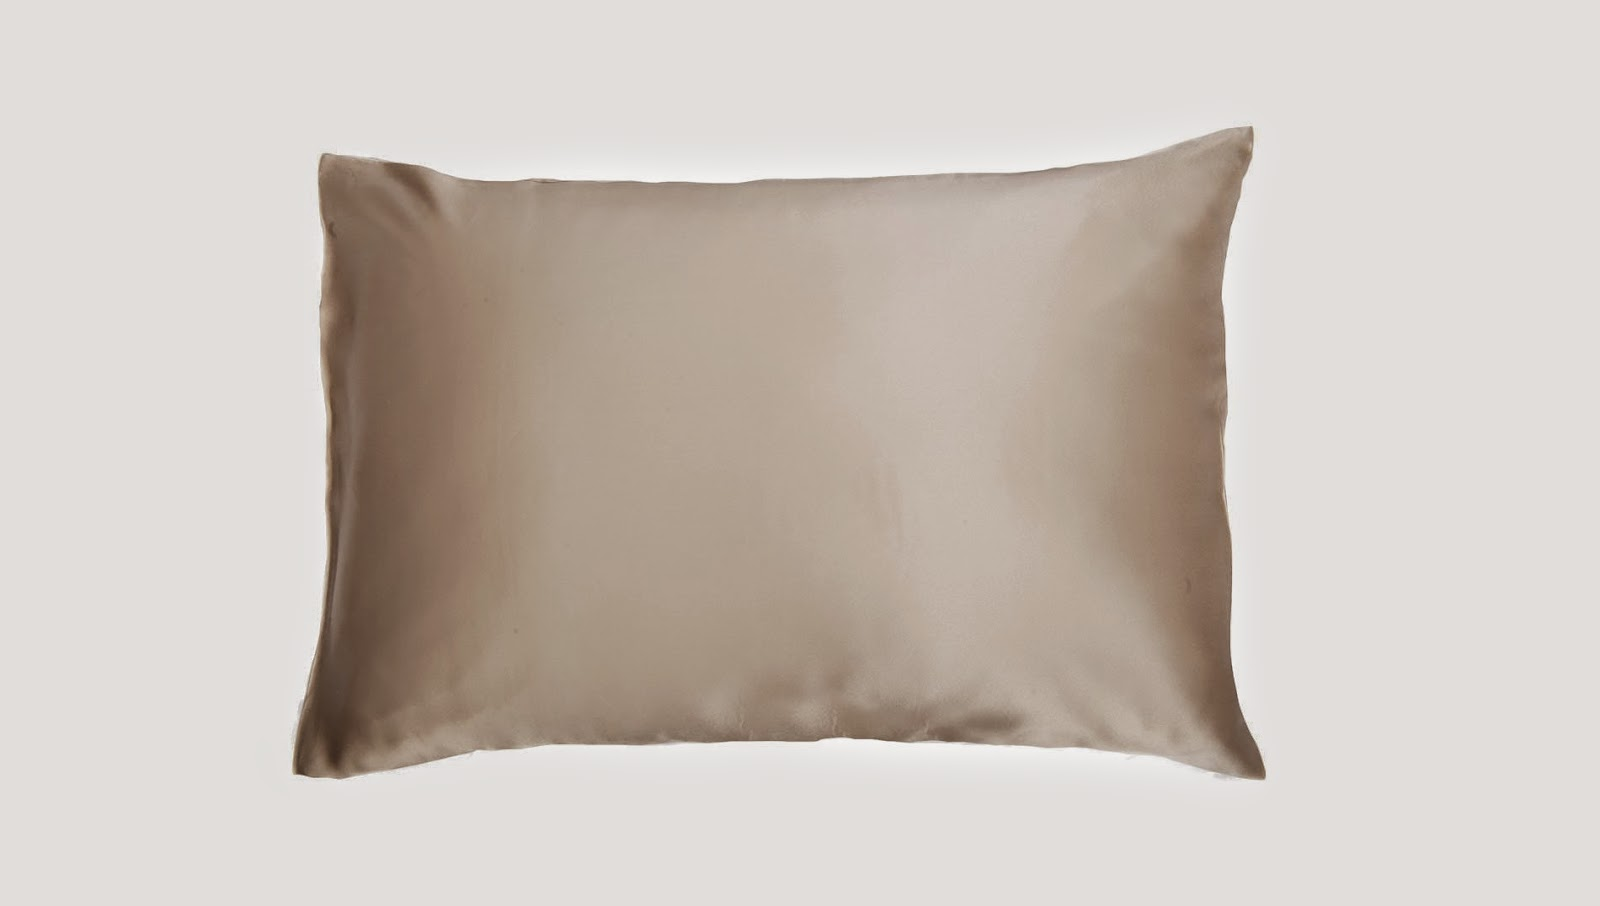 silk online com standard at lewis pdp pillowcase rsp johnlewis main pillow john mint buyjohn